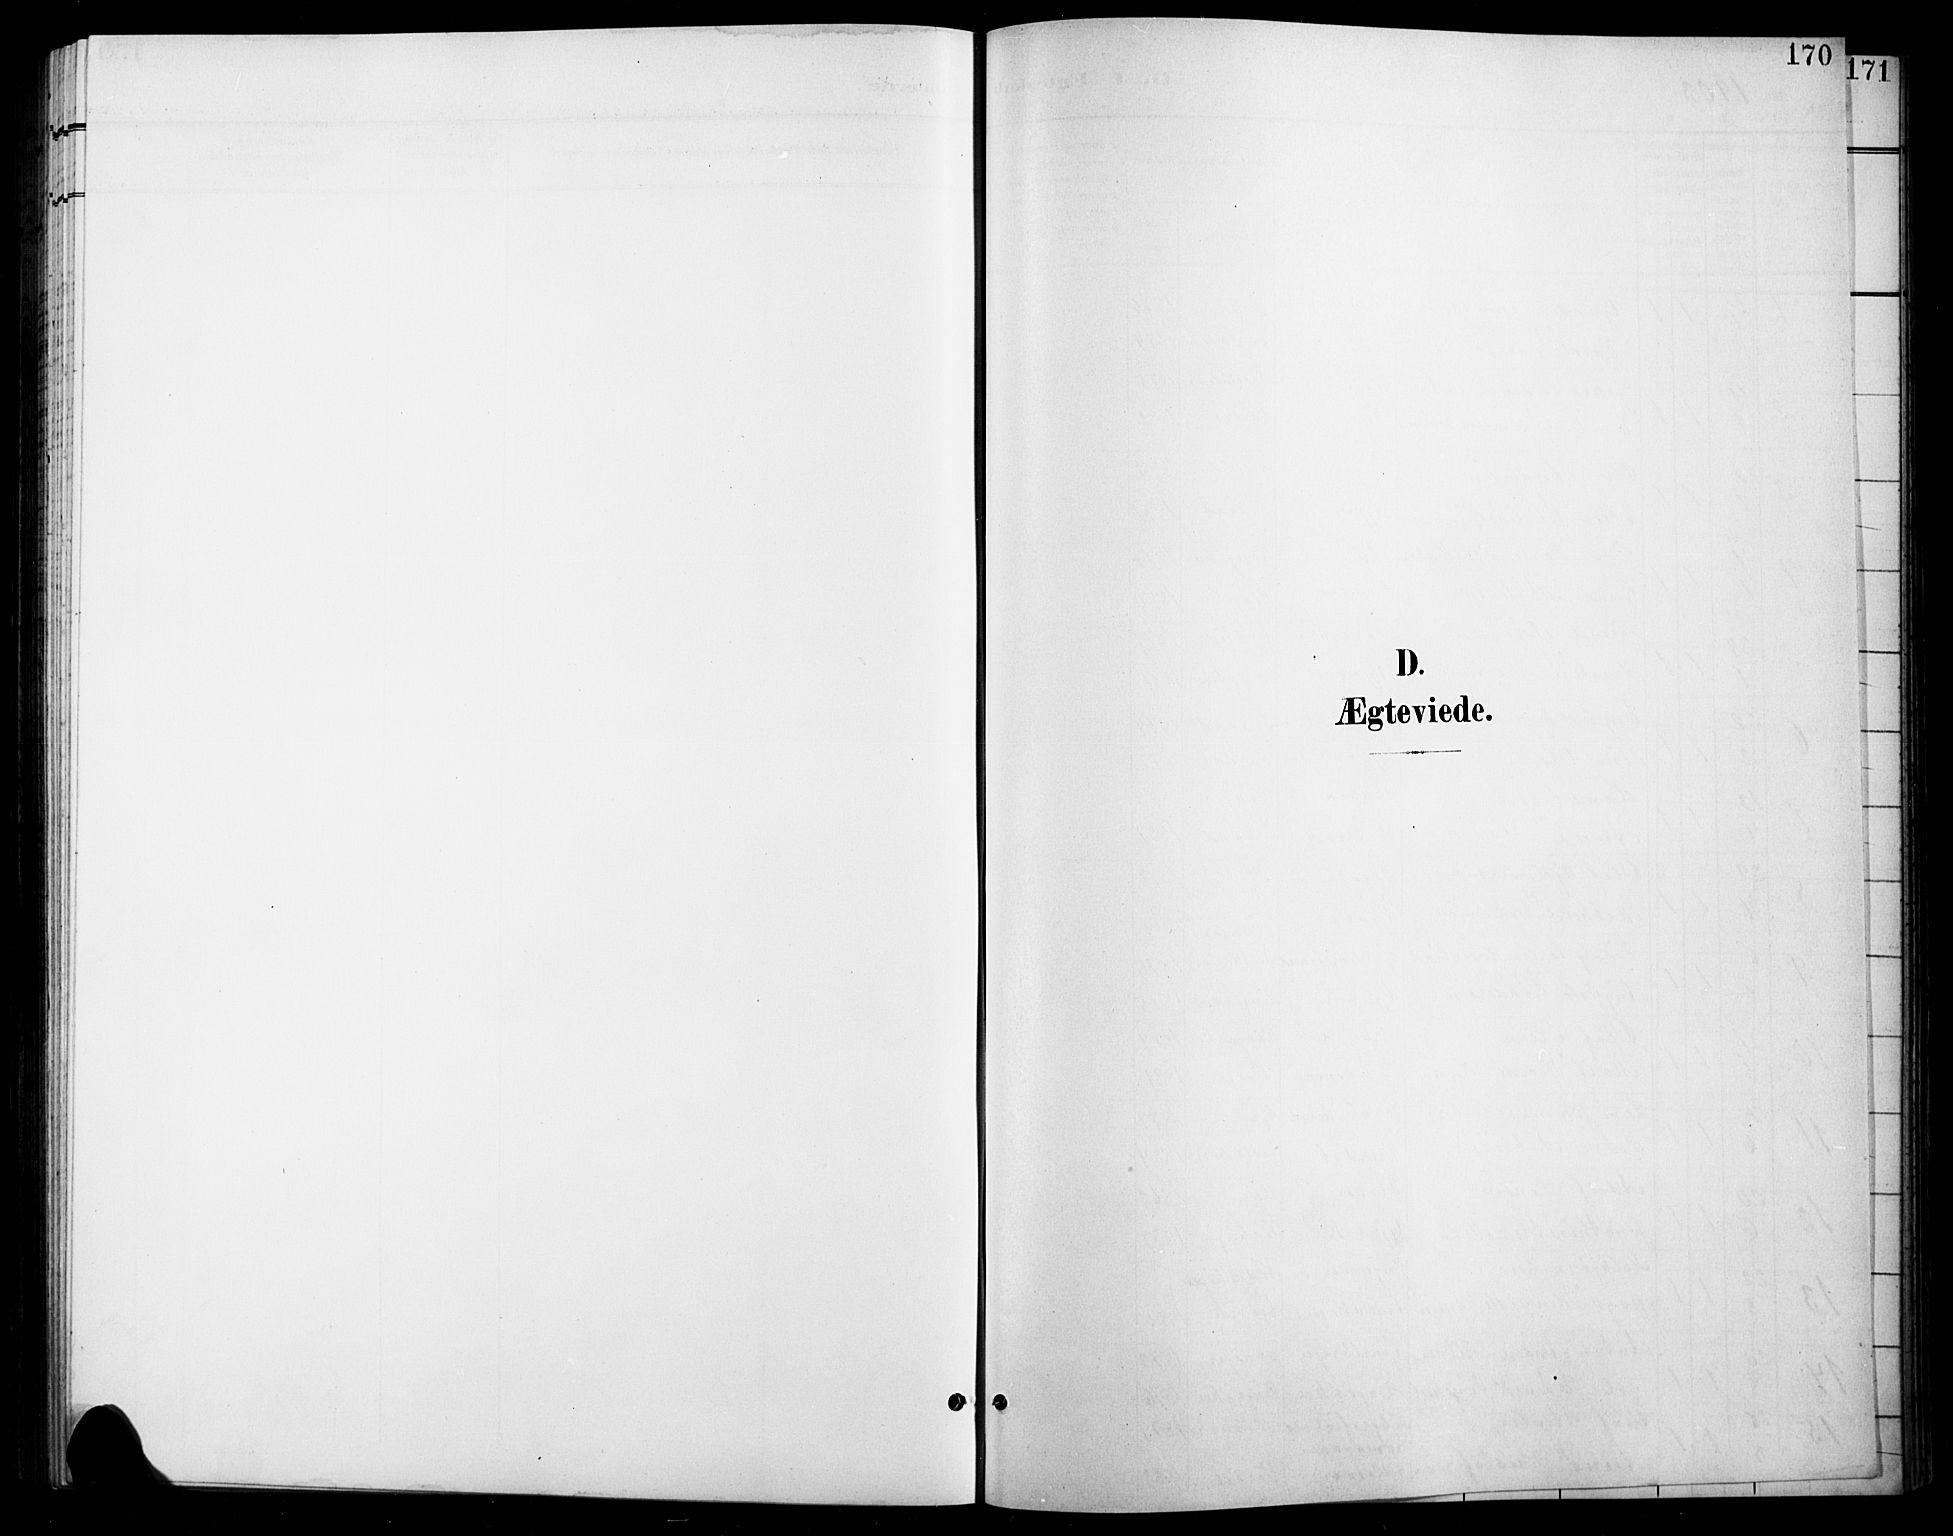 SAH, Vardal prestekontor, H/Ha/Hab/L0012: Klokkerbok nr. 12, 1902-1911, s. 170